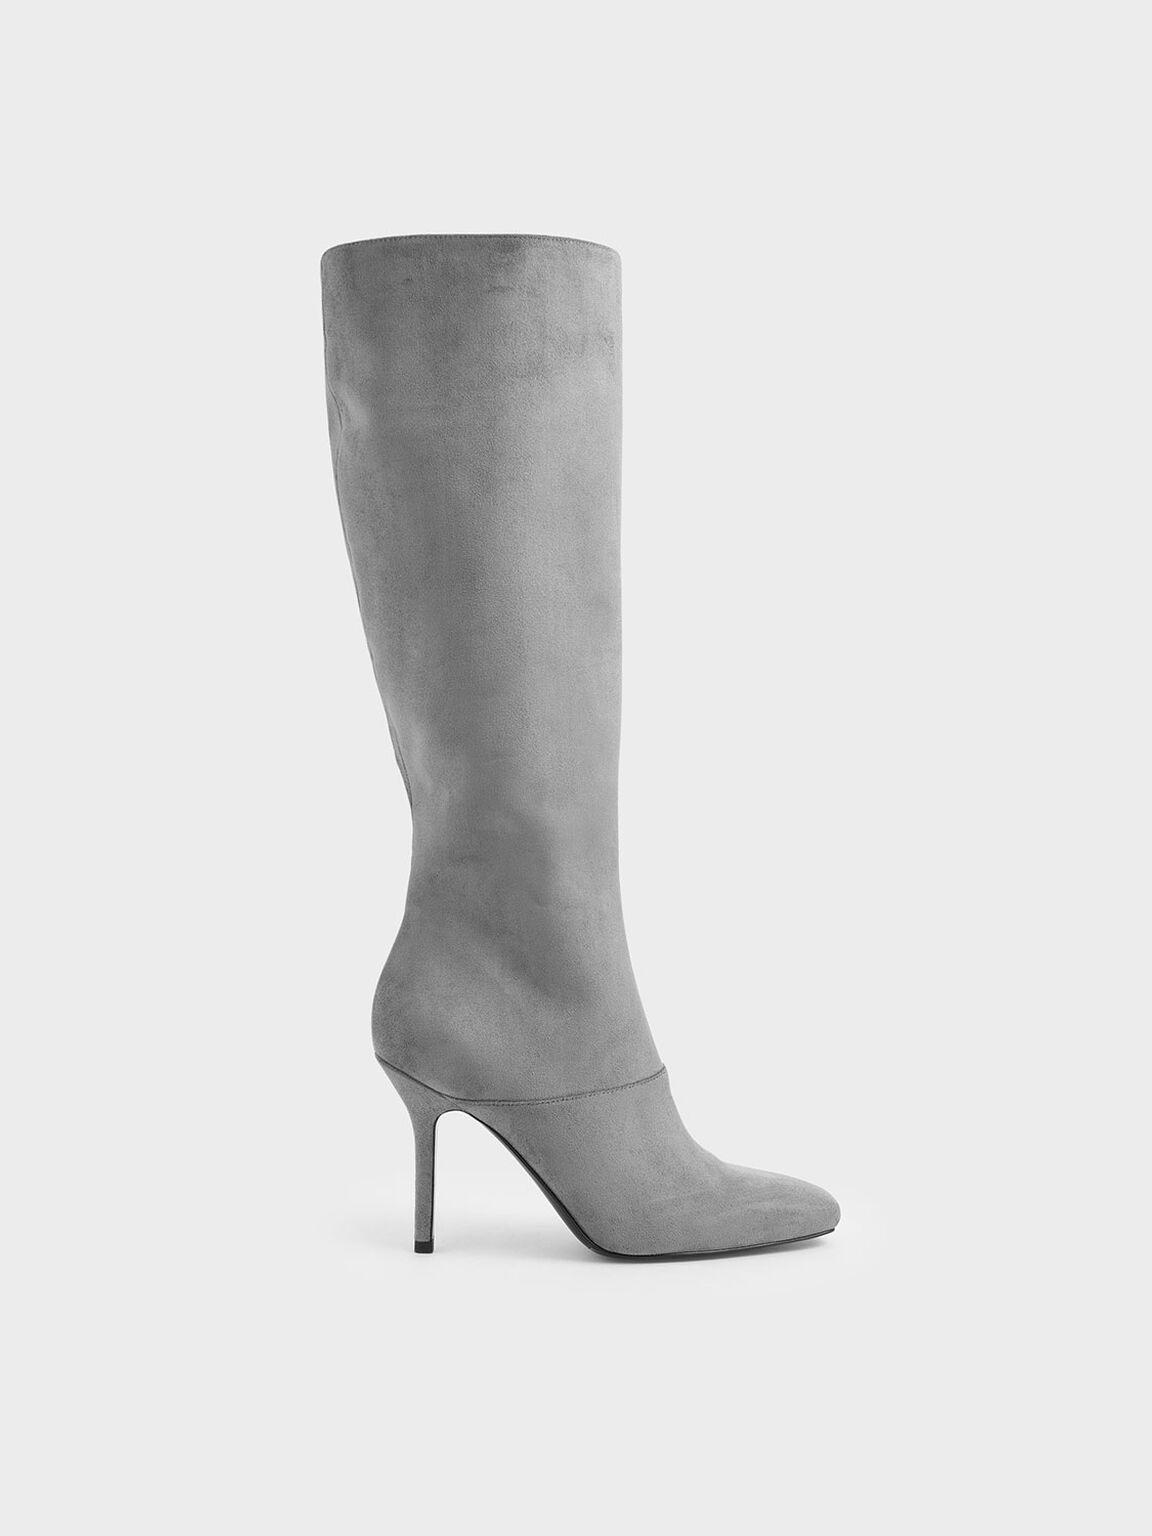 Textured Knee High Boots, Grey, hi-res